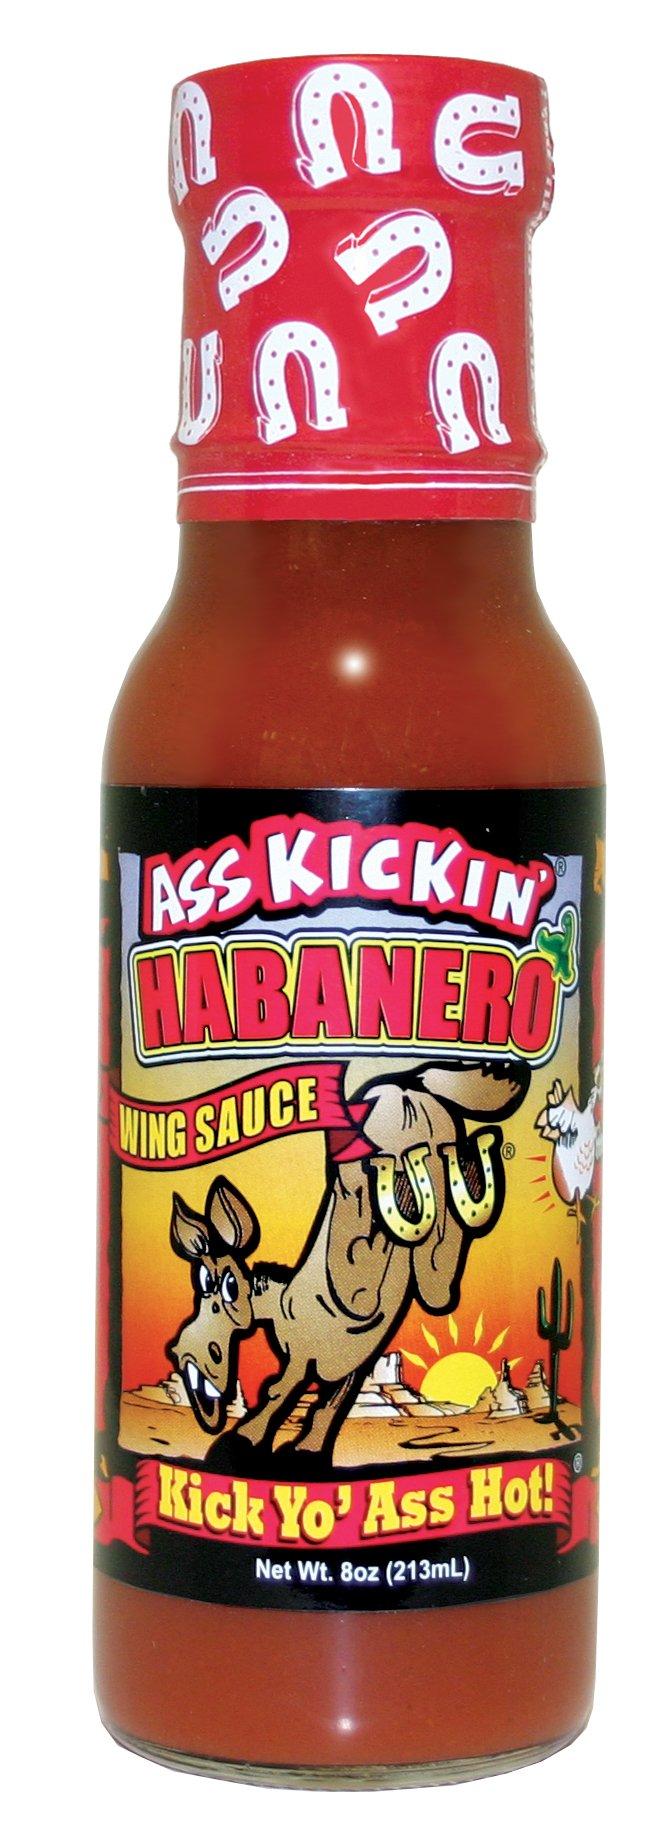 Ass Kickin' Habanero Wing Sauce